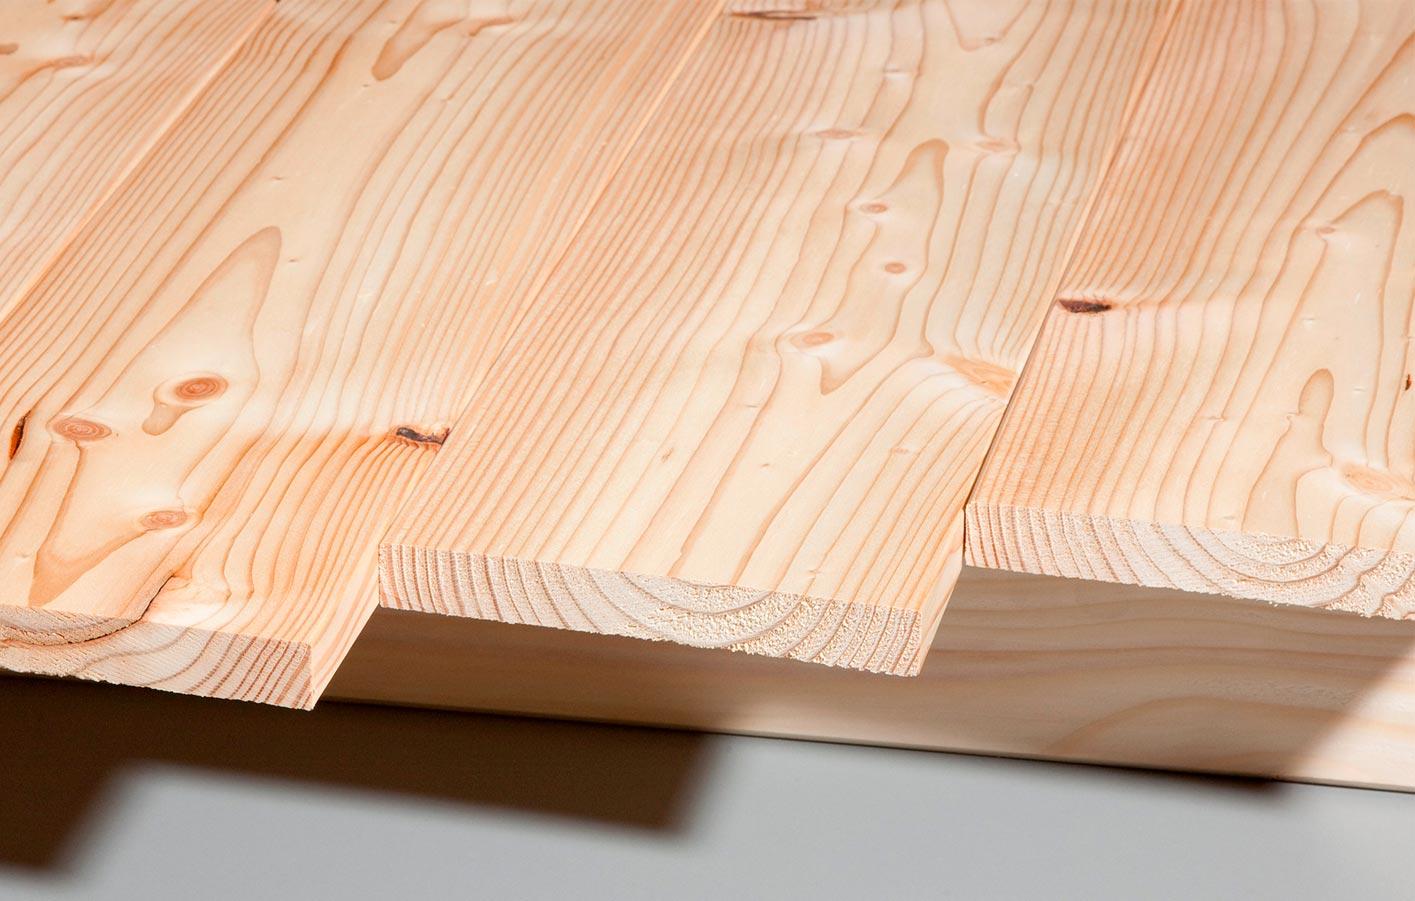 osb-platten verlegeplatten mdf-platten holz apolda weimar jena